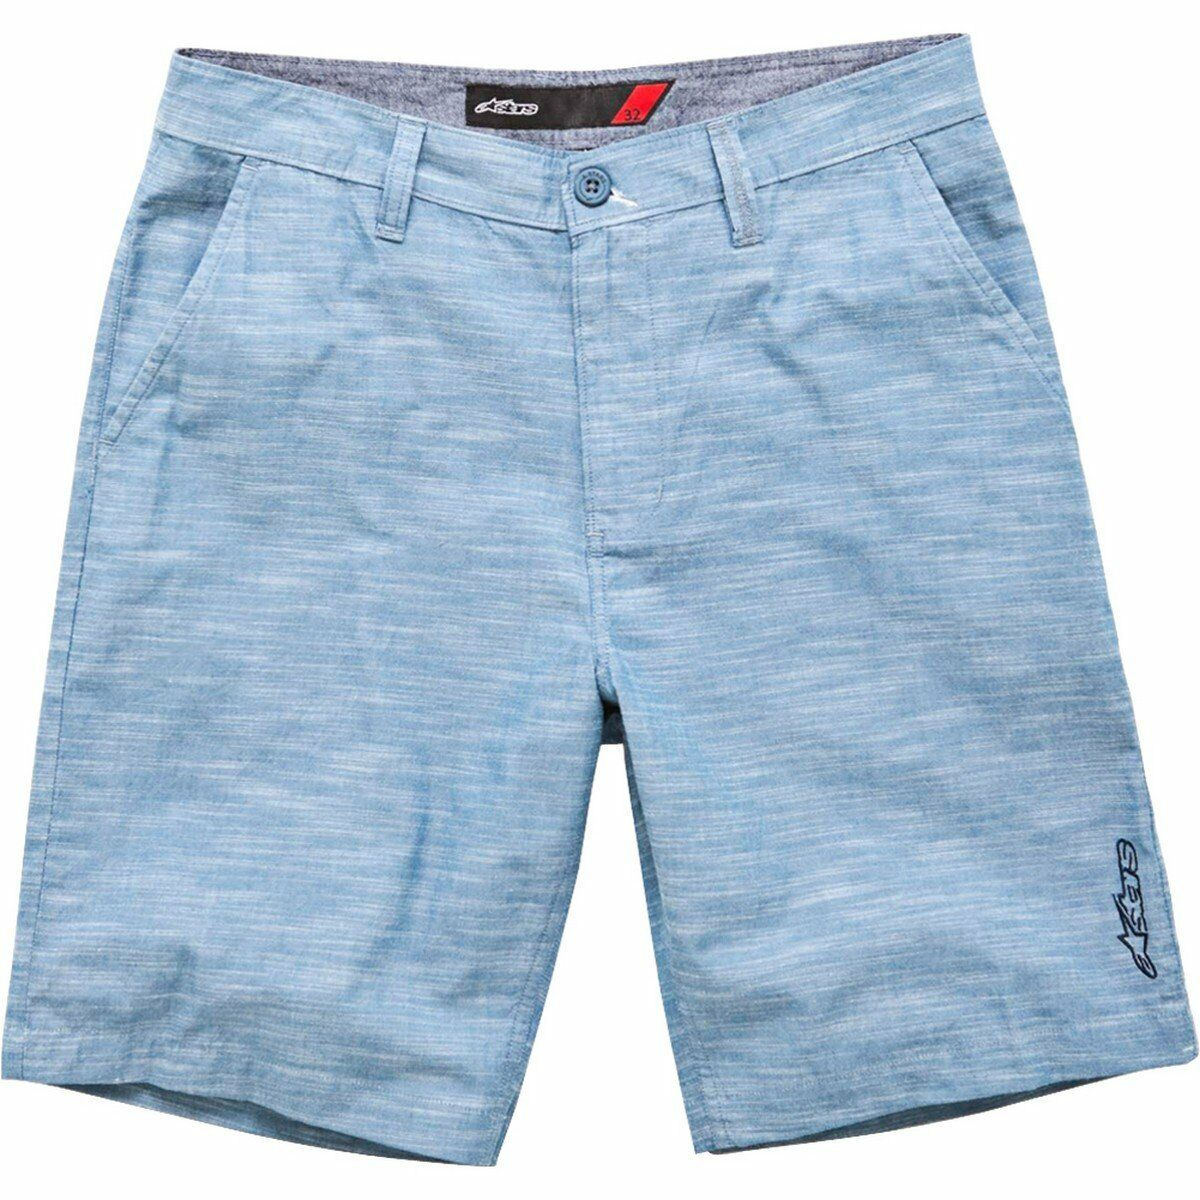 Alpinestars Cordite WalkShorts (32) bluee